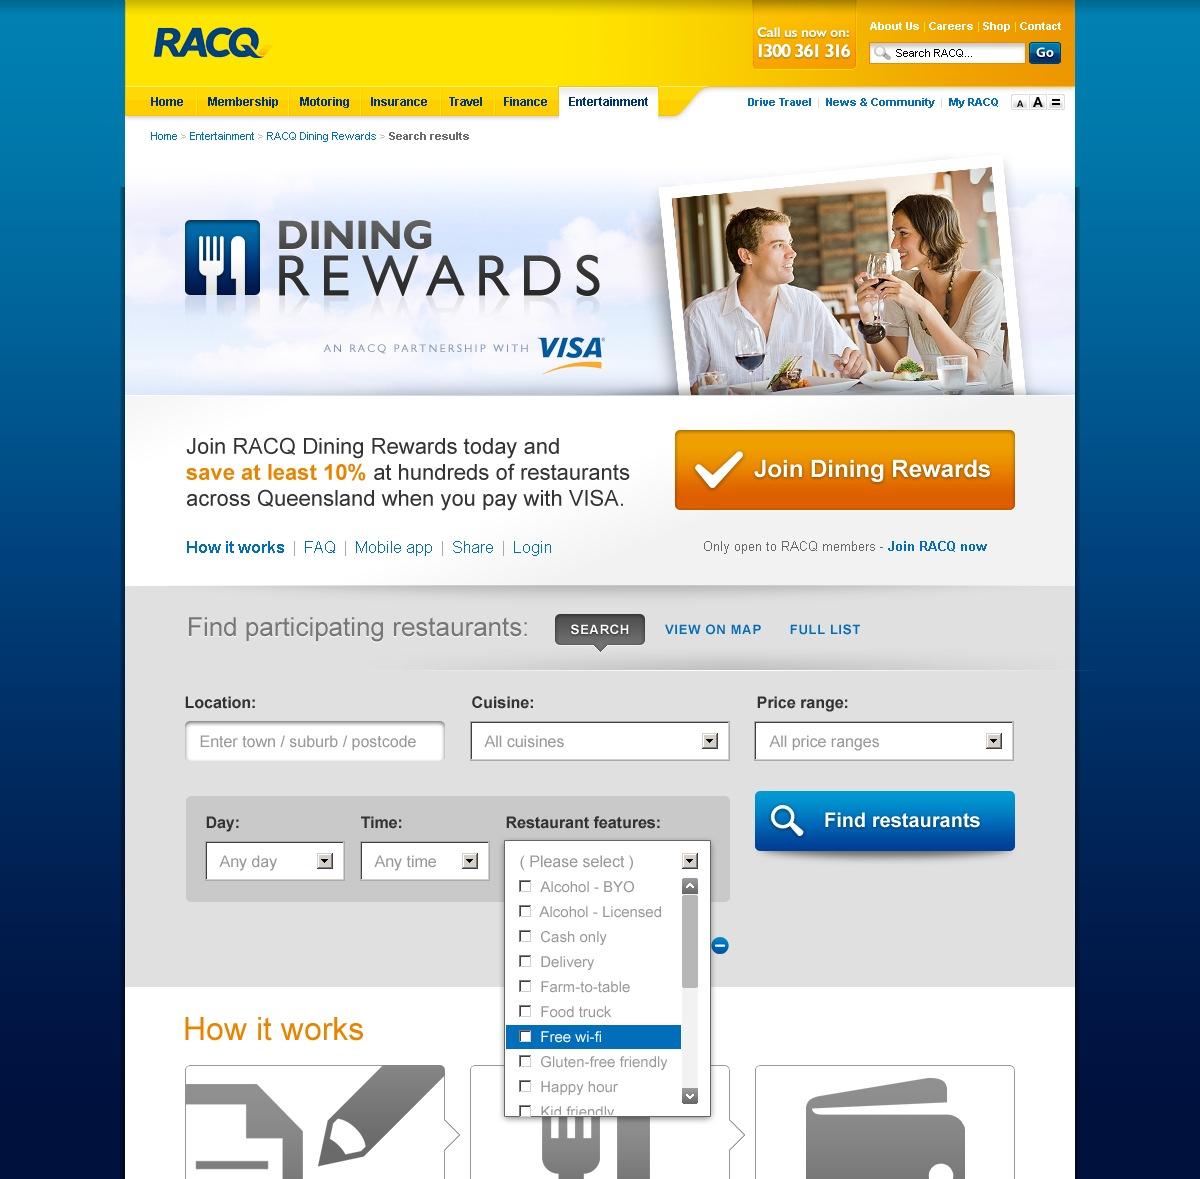 2013-03-Dining-rewards-landing-search-v10_0003_Advanced-search---multi-hilite.jpg